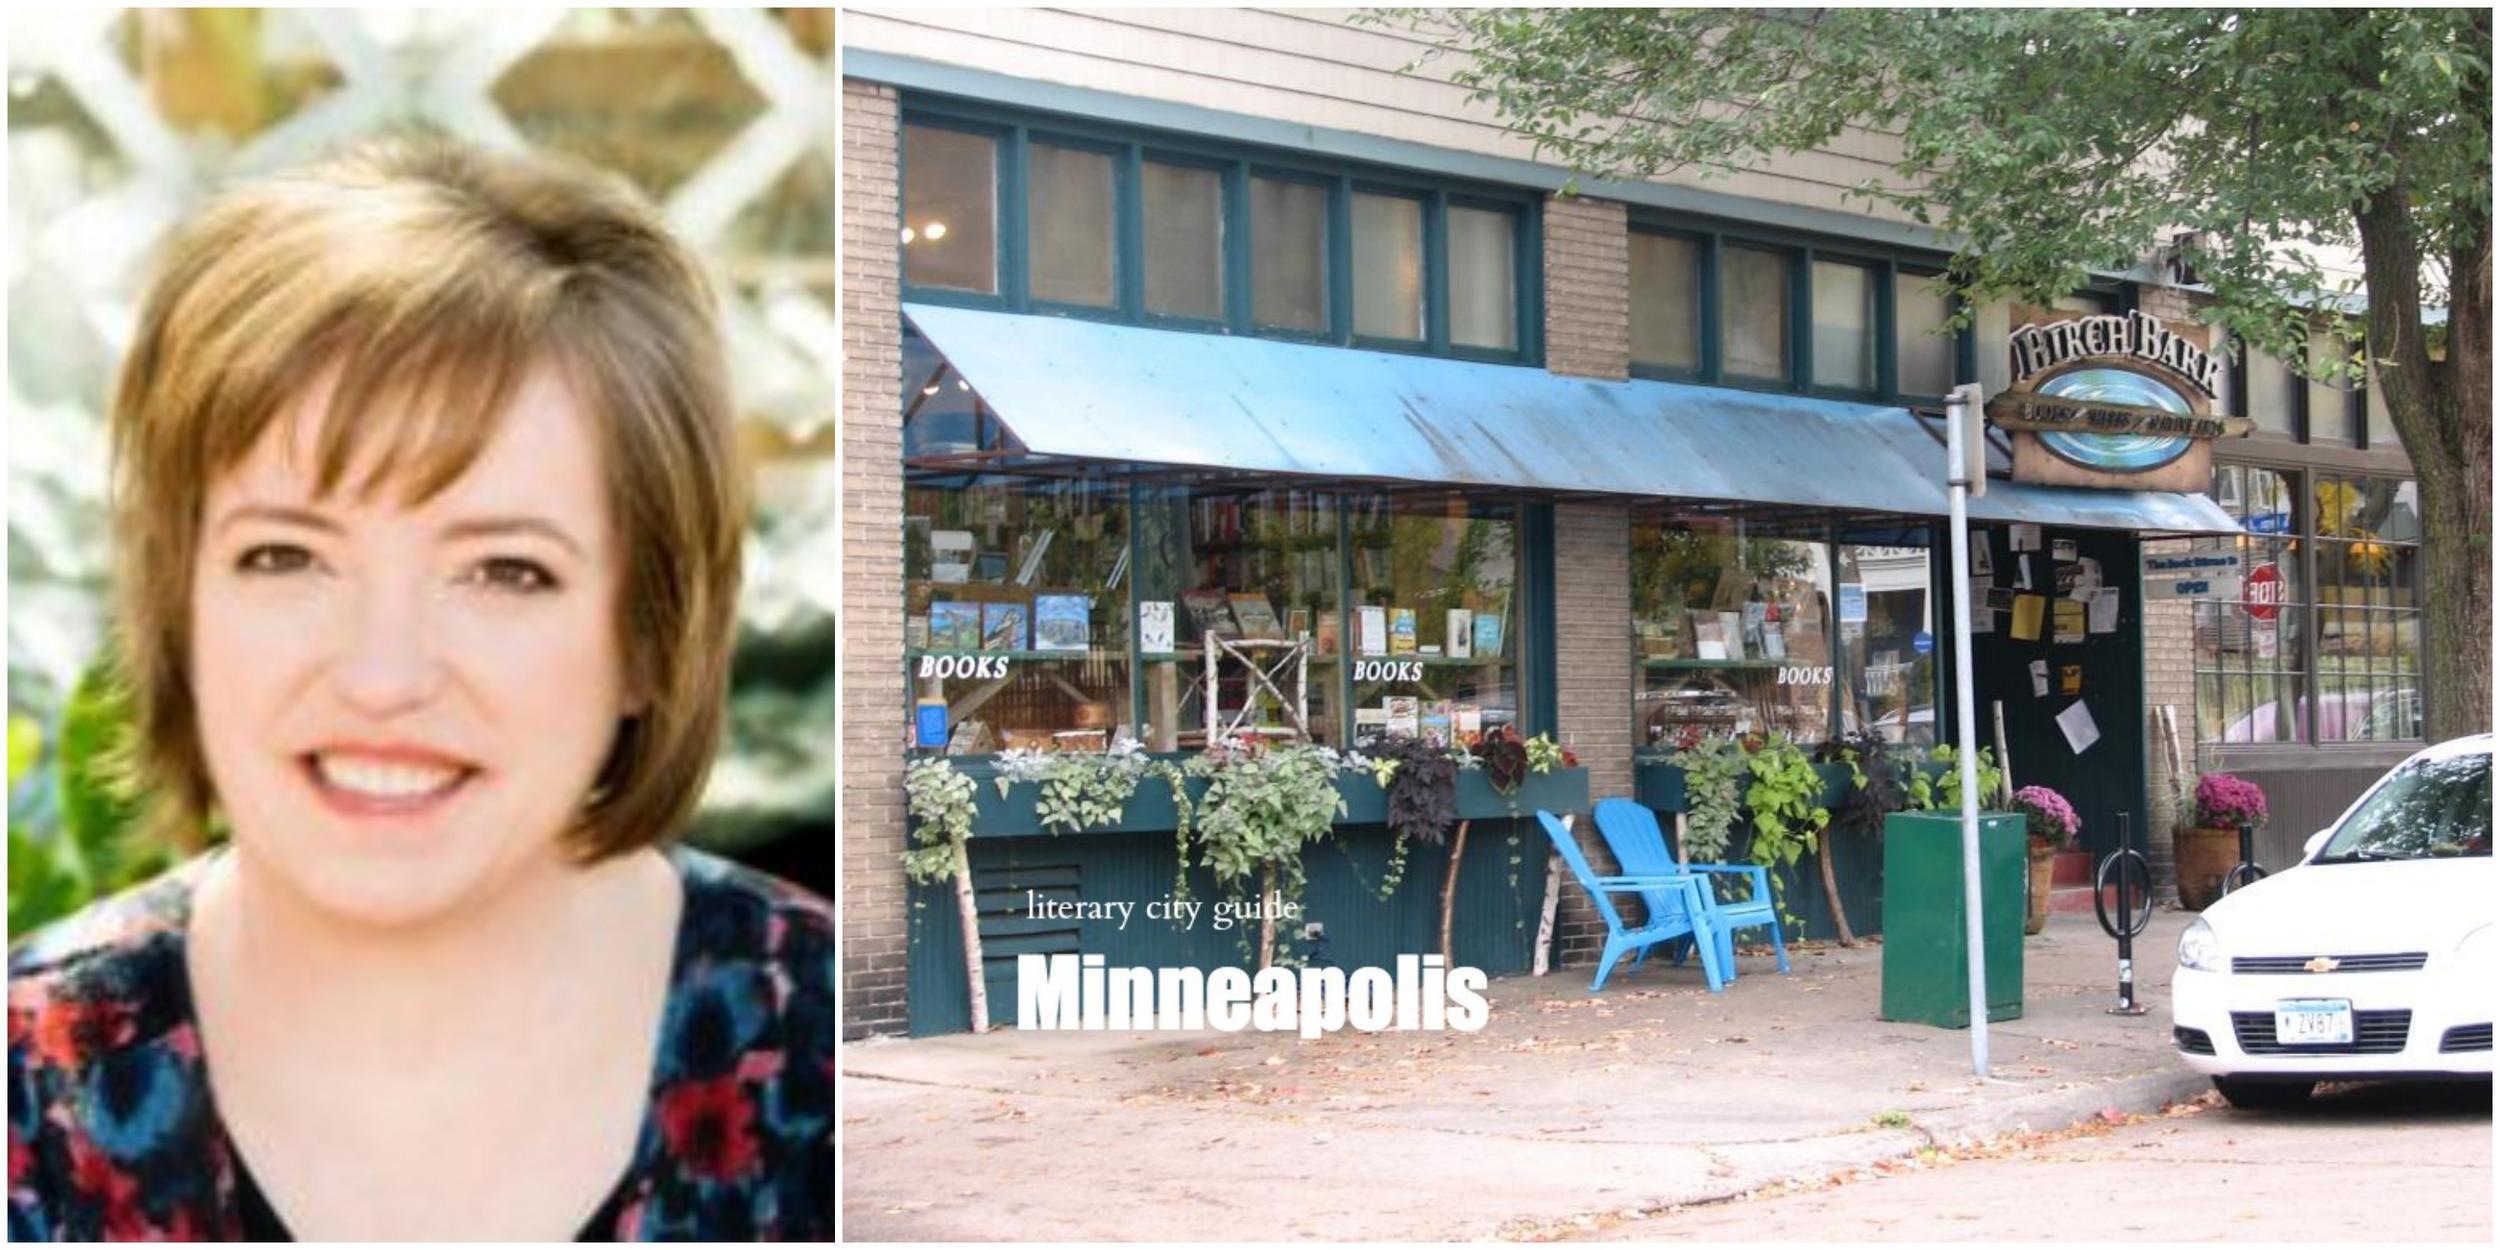 Literary City Guide Minneapolis Collage.jpg